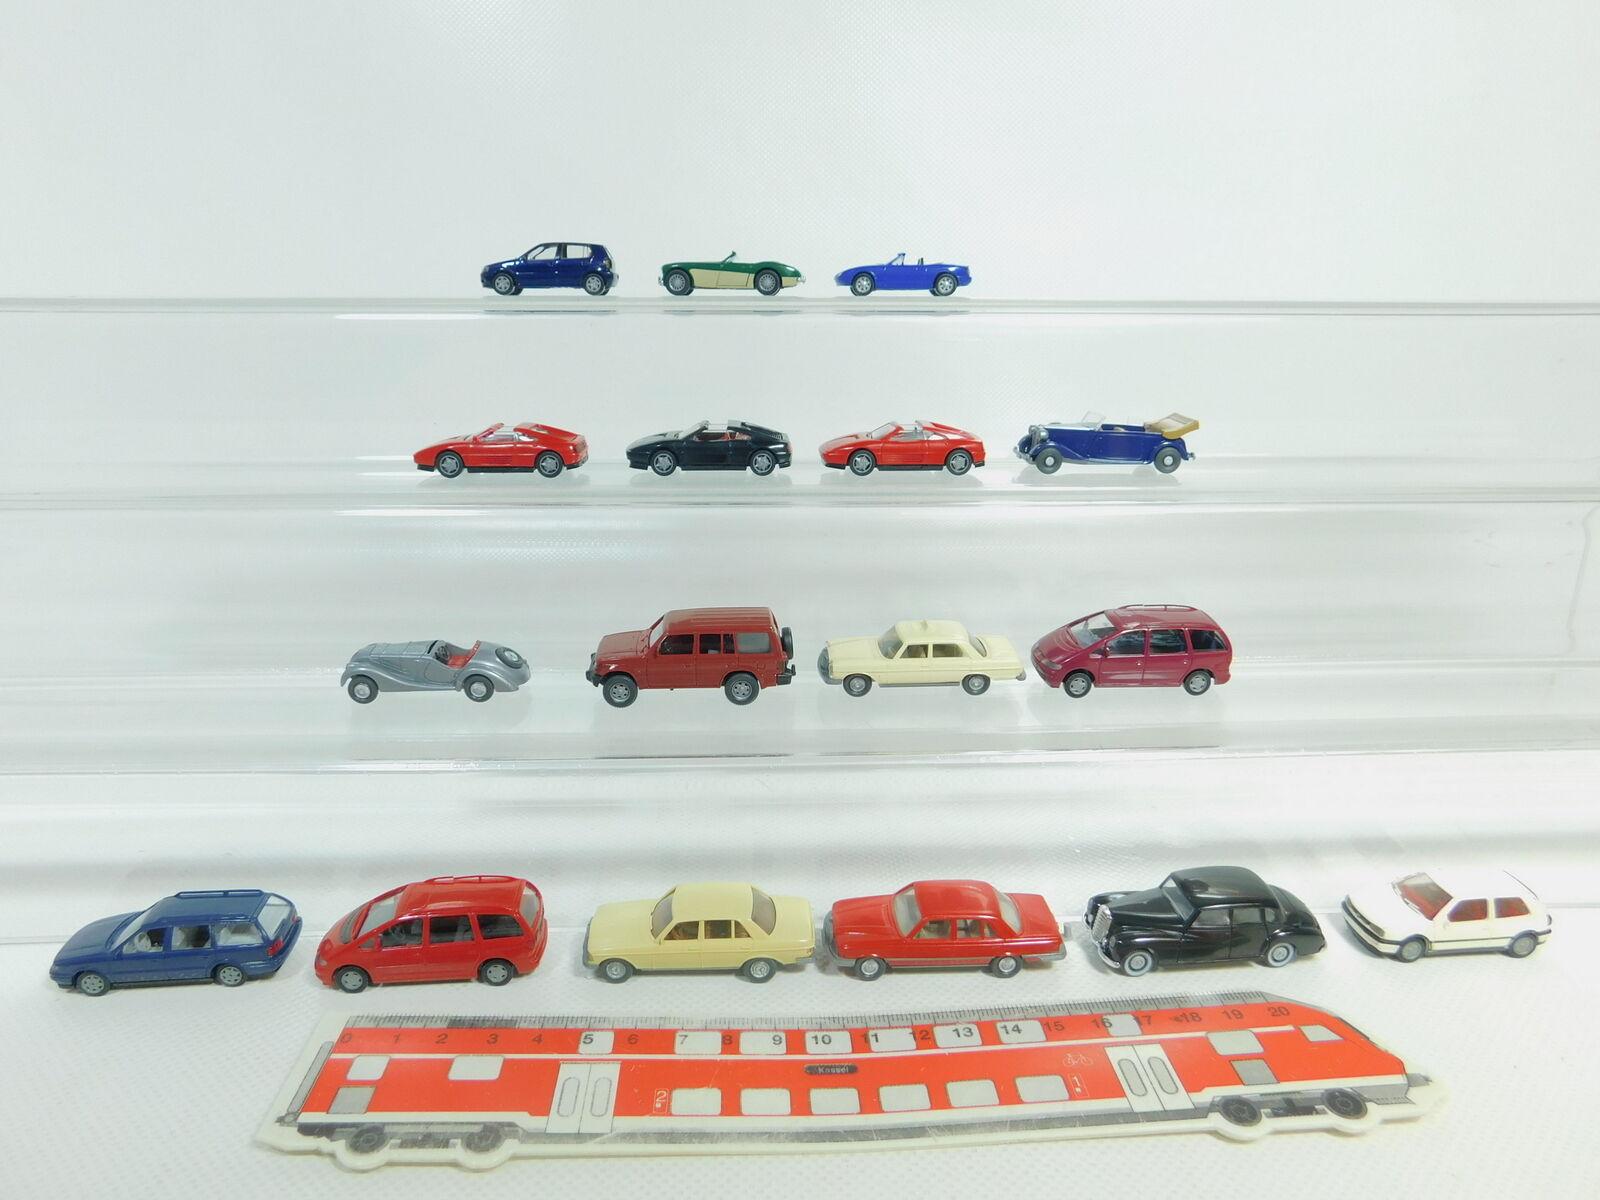 BO625-1 x Wiking H0   1 87 Car  VW + MB + Ferrari+ Mitusbishi+ Audi etc. ,2.